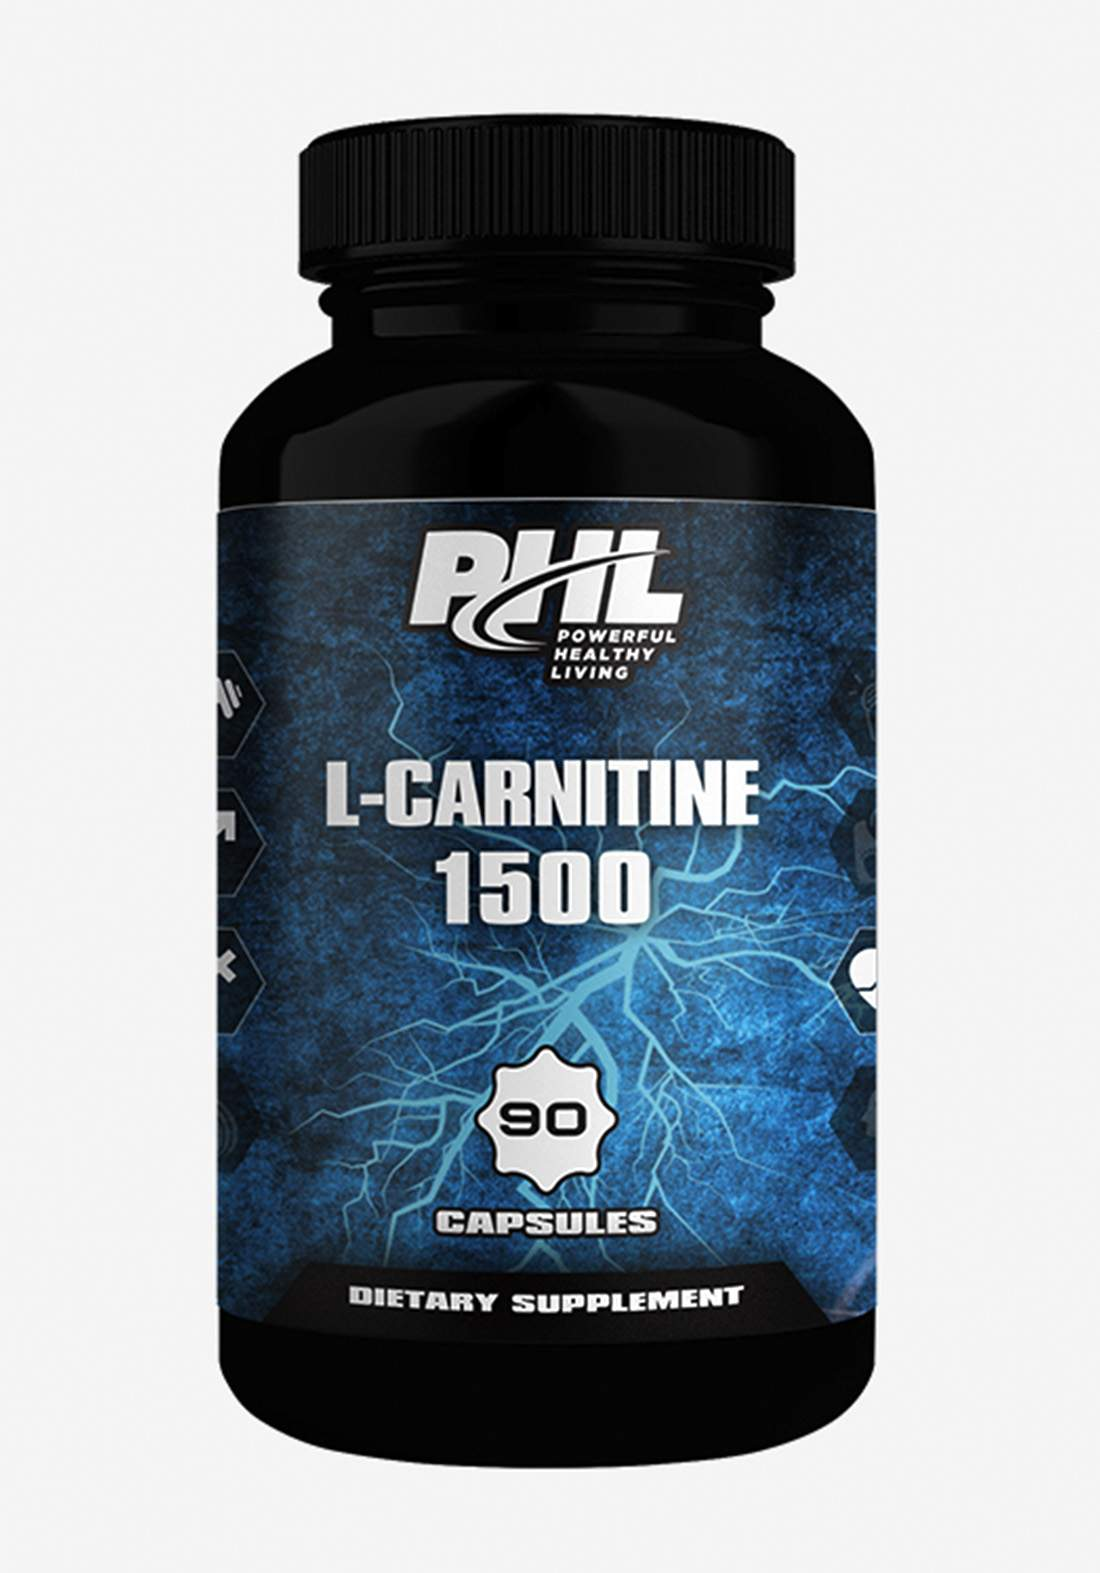 PHL L-Carnitine 1500 90 Capsules مكمل غذائي